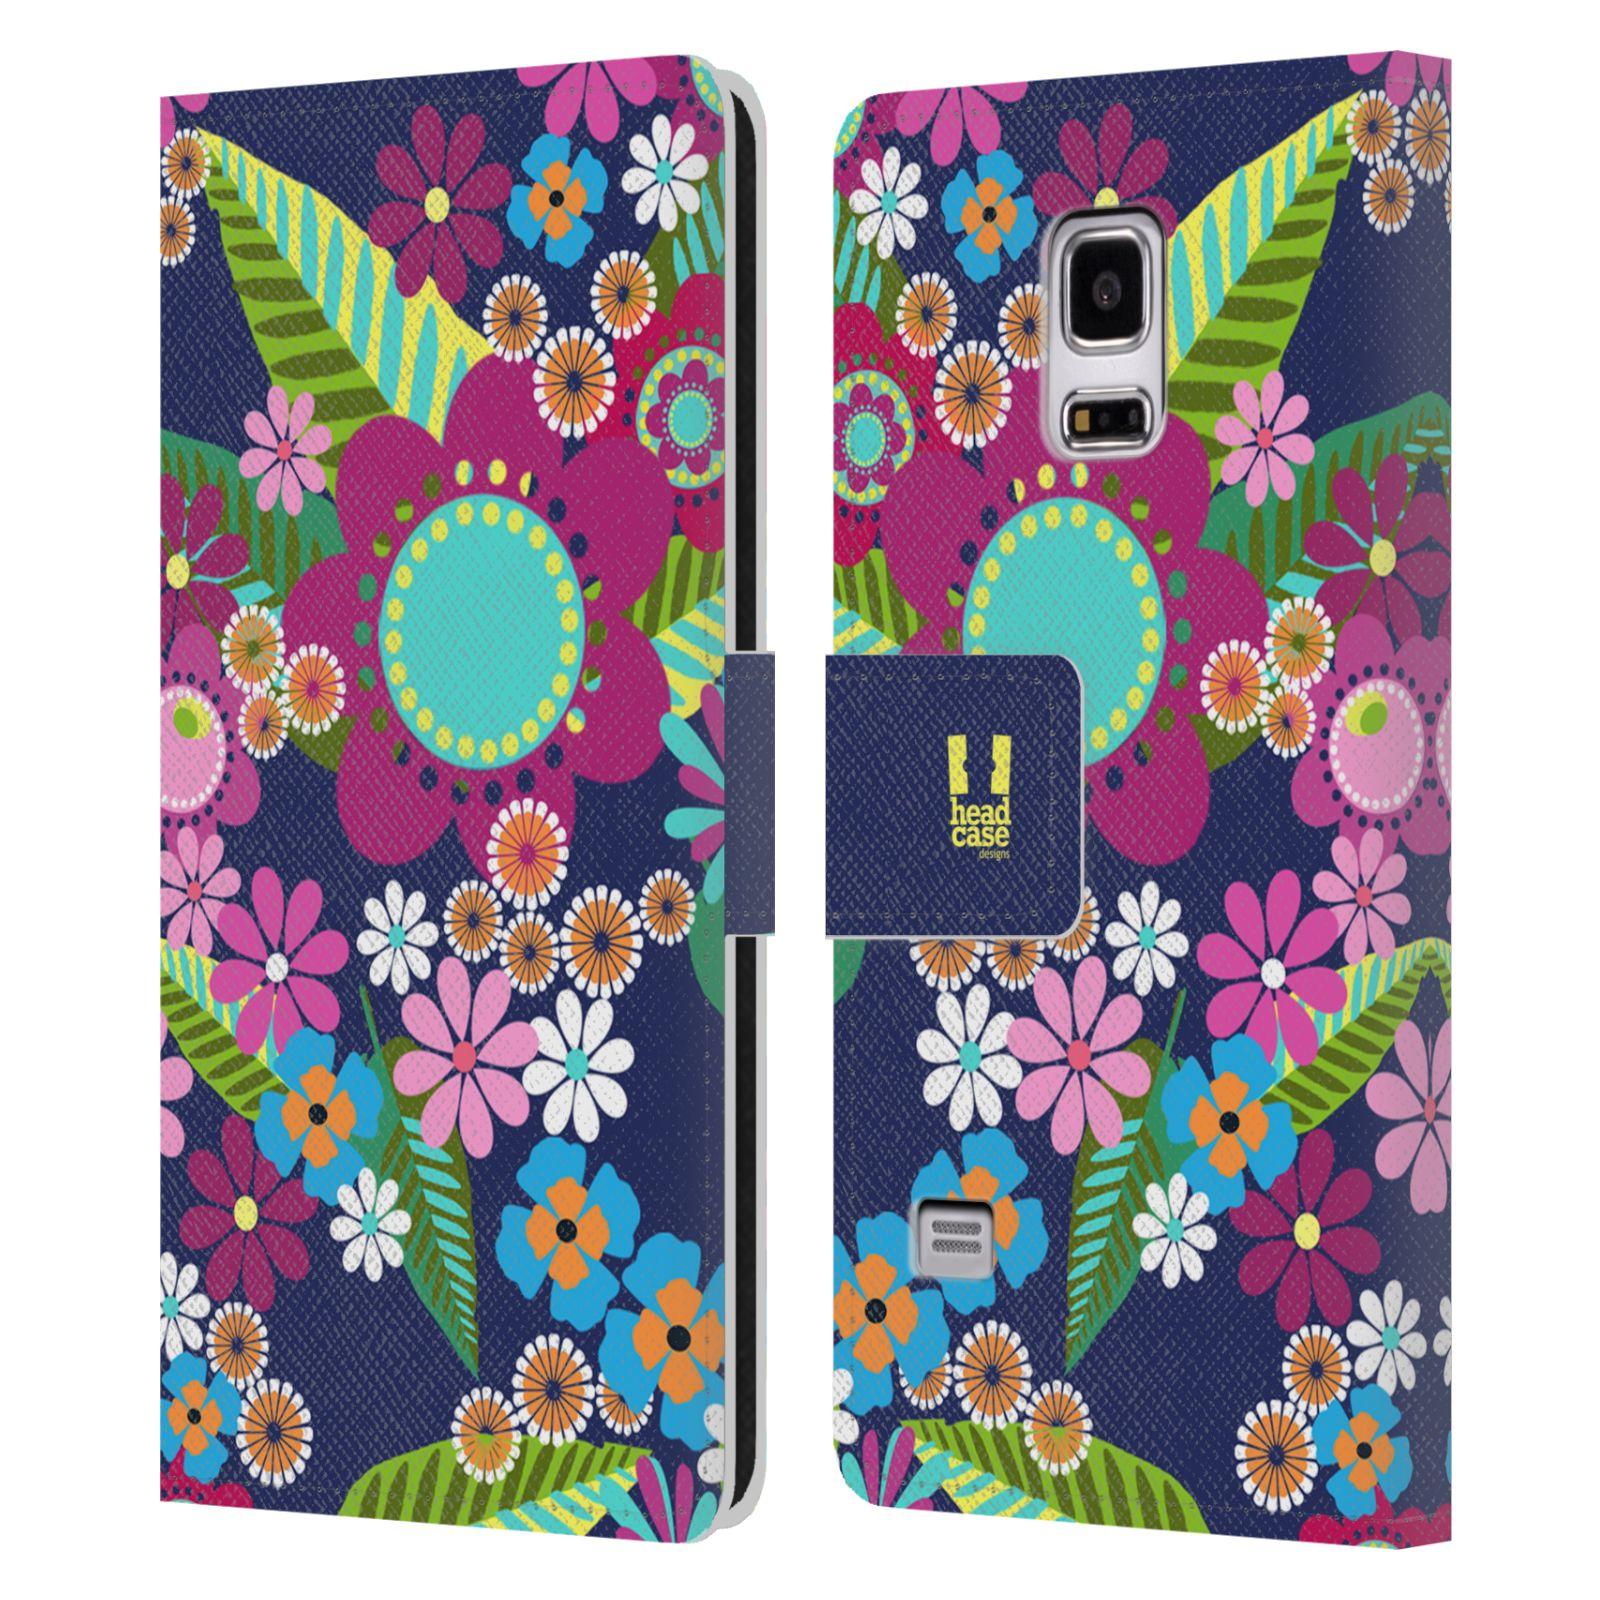 HEAD CASE Flipové pouzdro pro mobil Samsung Galaxy S5 MINI / S5 MINI DUOS BOTANIKA barevné květy modrá